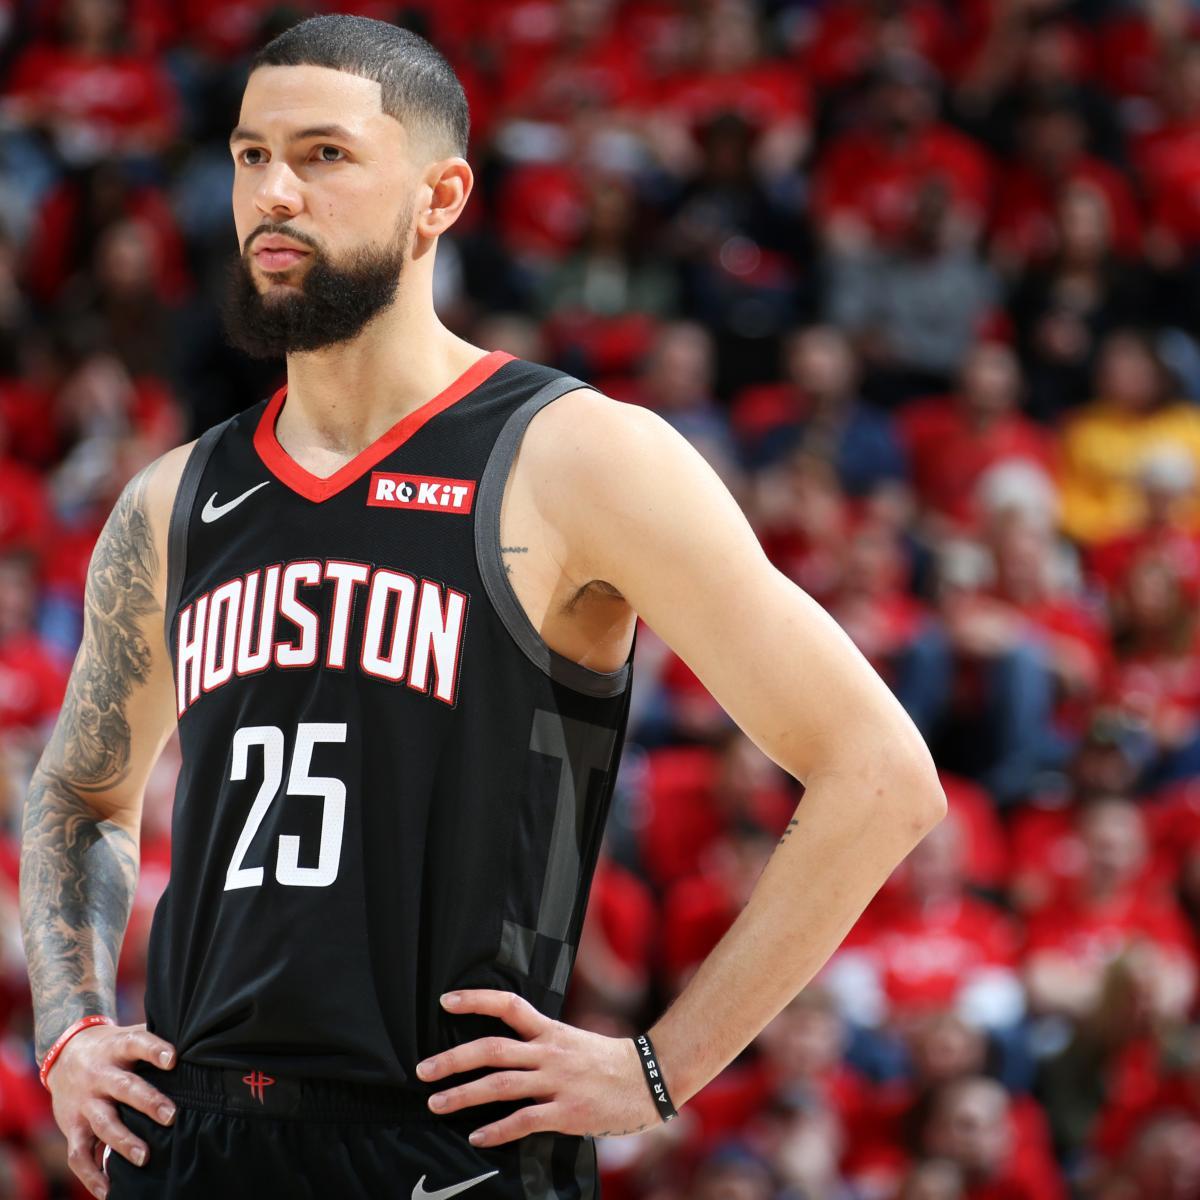 Rockets Vs Warriors Game 7 Where: Austin Rivers To Play In Rockets Vs. Warriors Game 2 After